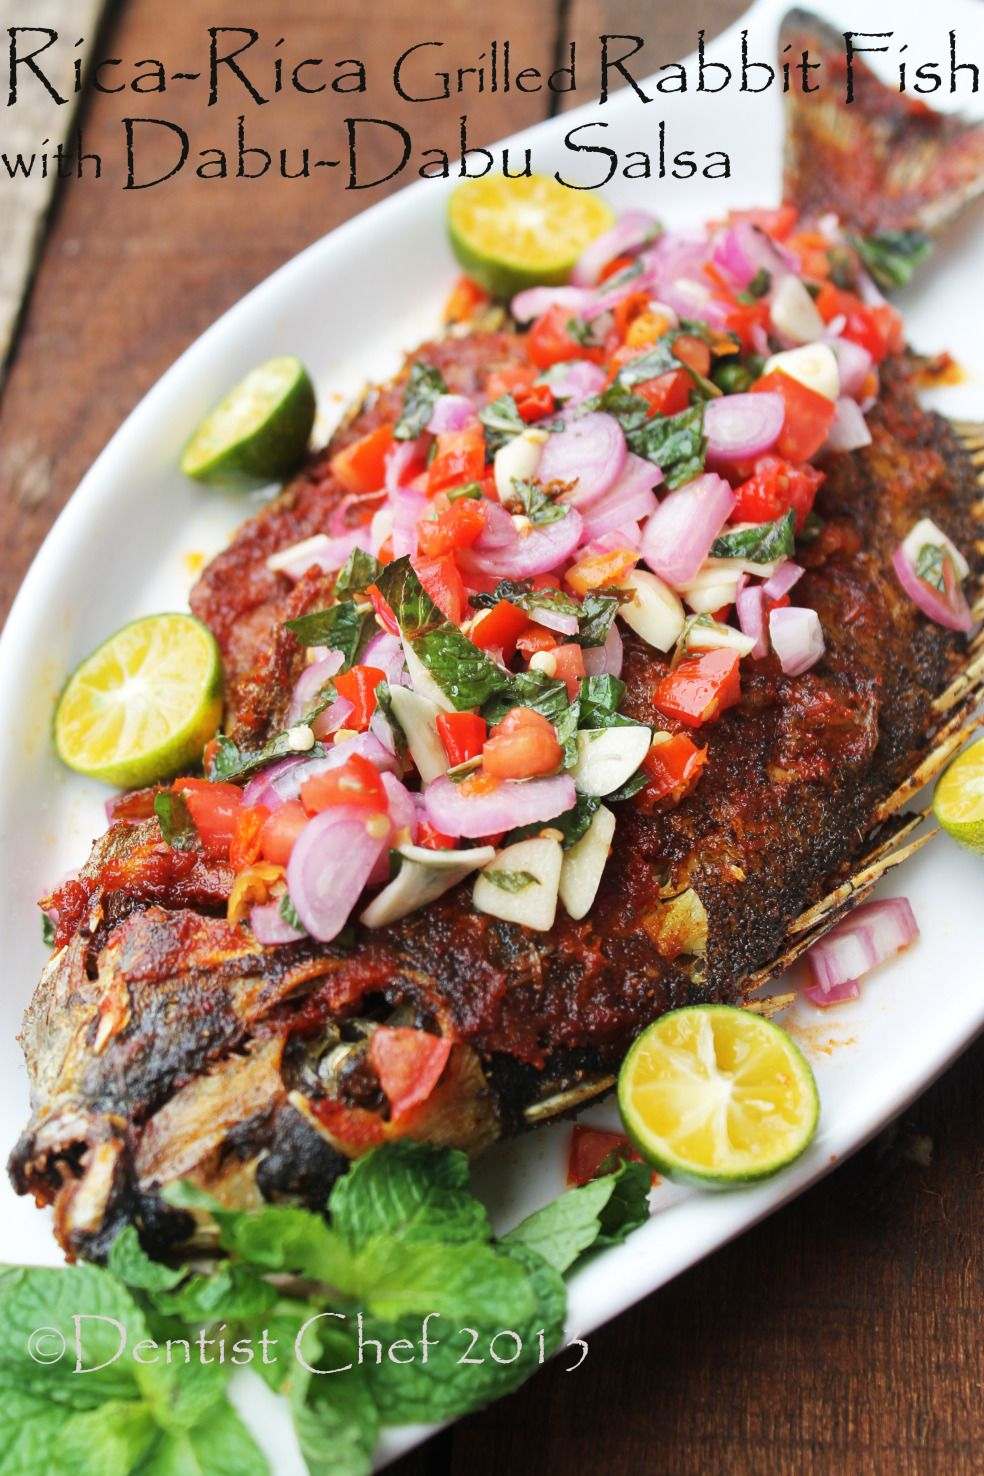 Ikan Baronang Bakar Bumbu Rica Rica Sambal Dabu Dabu Grilled Rabbit Fish With Spicy Rica Rica Dabu Dabu Salsa Resep Masakan Pedas Resep Ikan Resep Masakan Asia